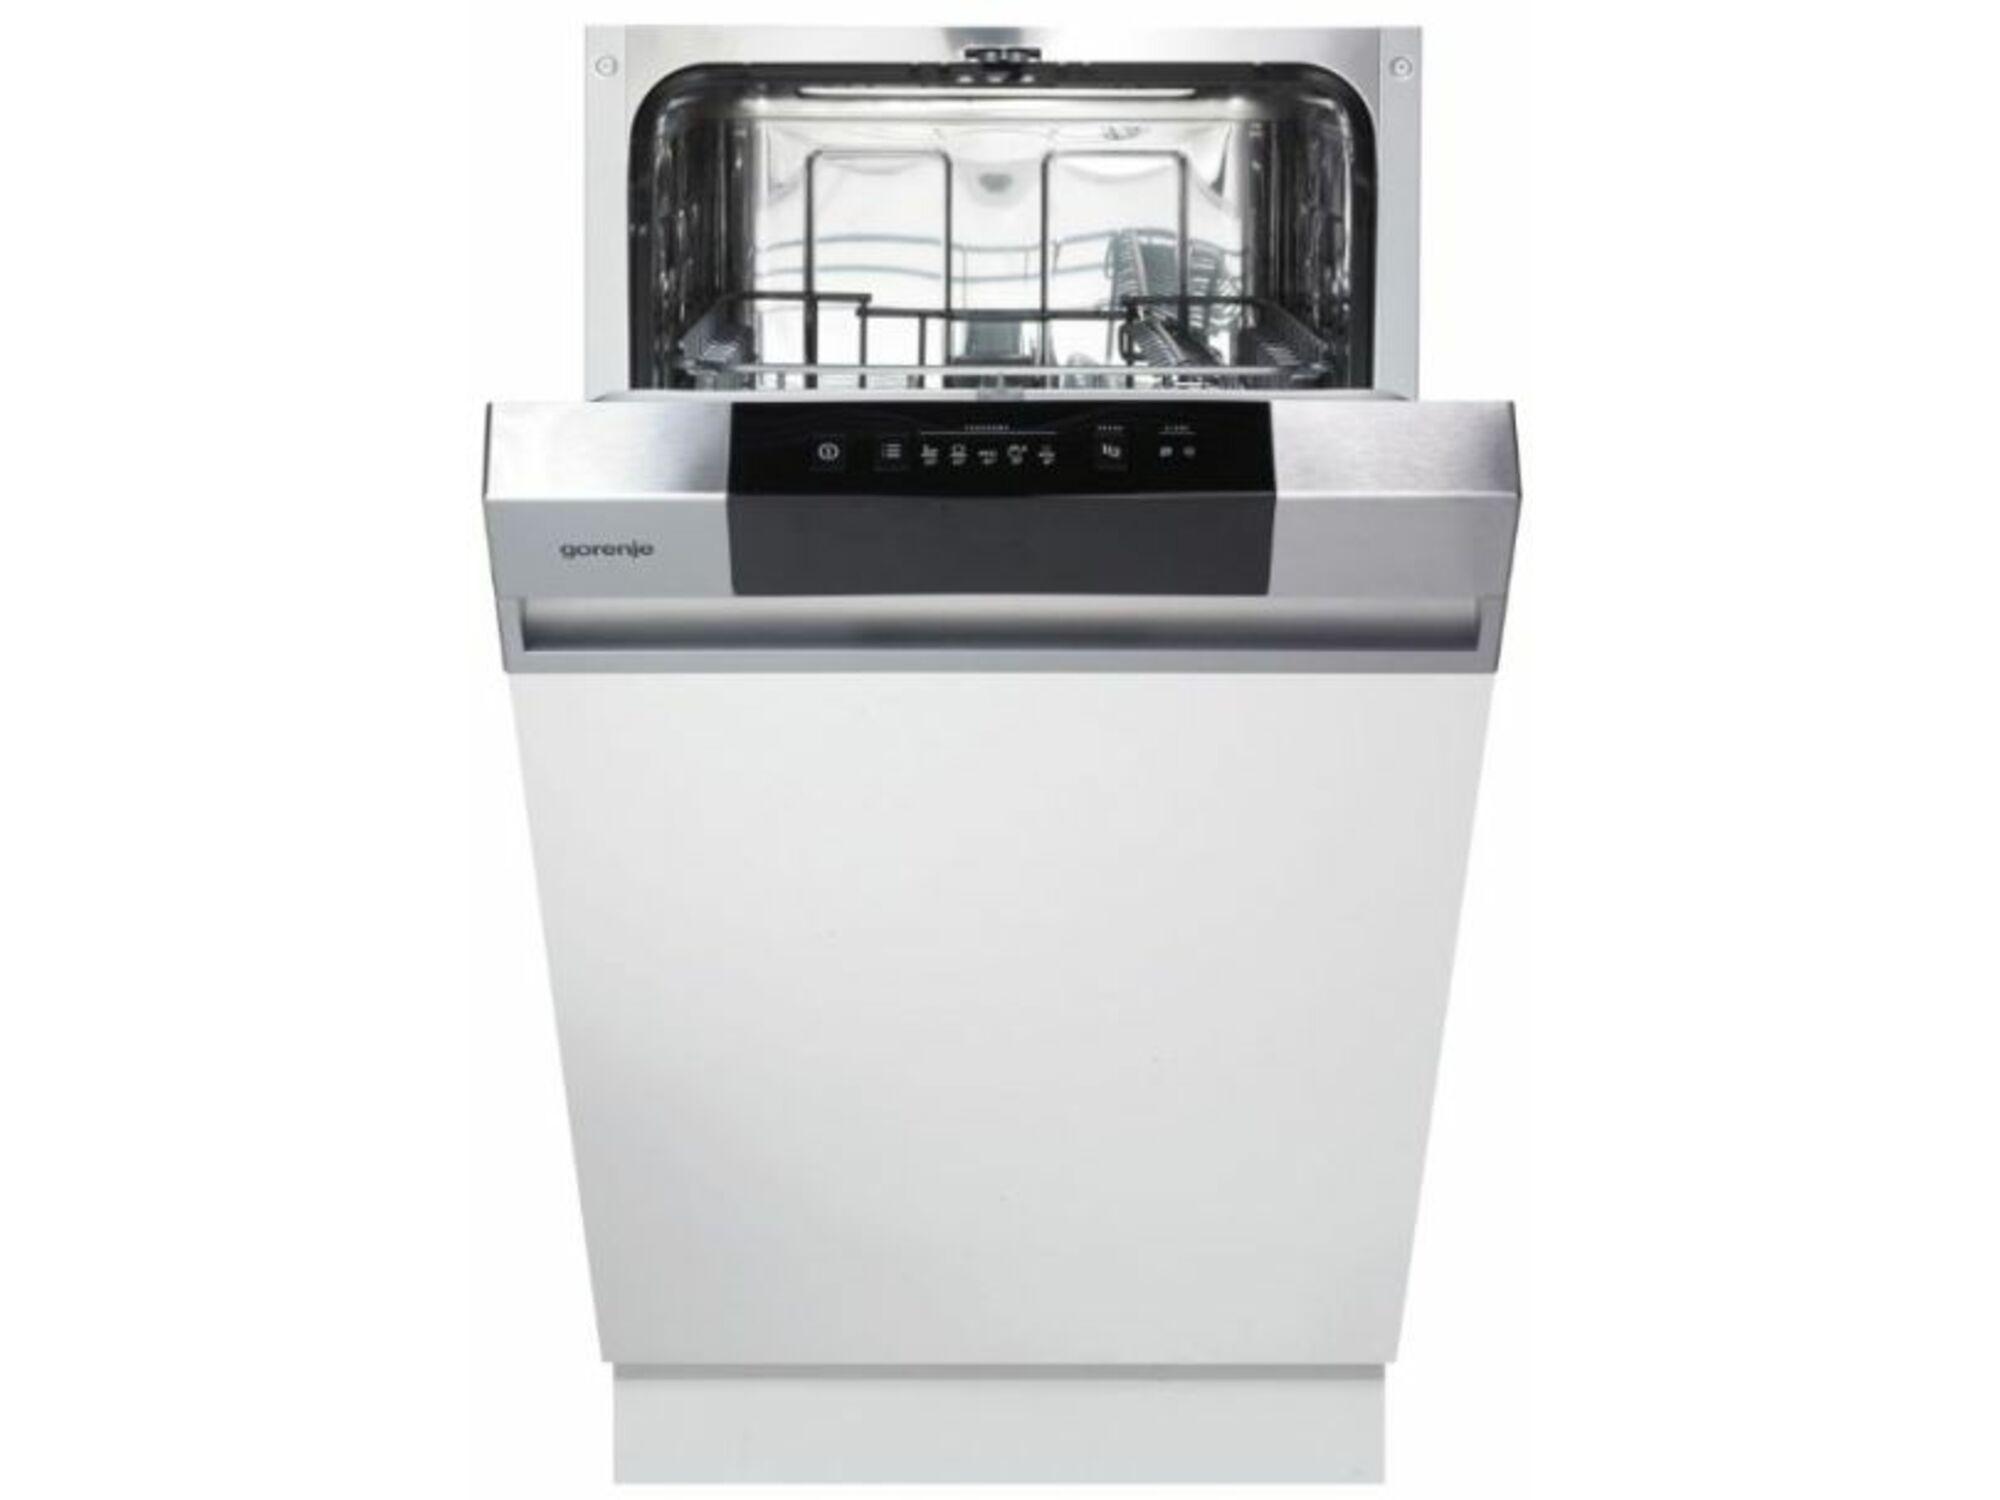 Gorenje Mašina za pranje sudova GI 52010 X